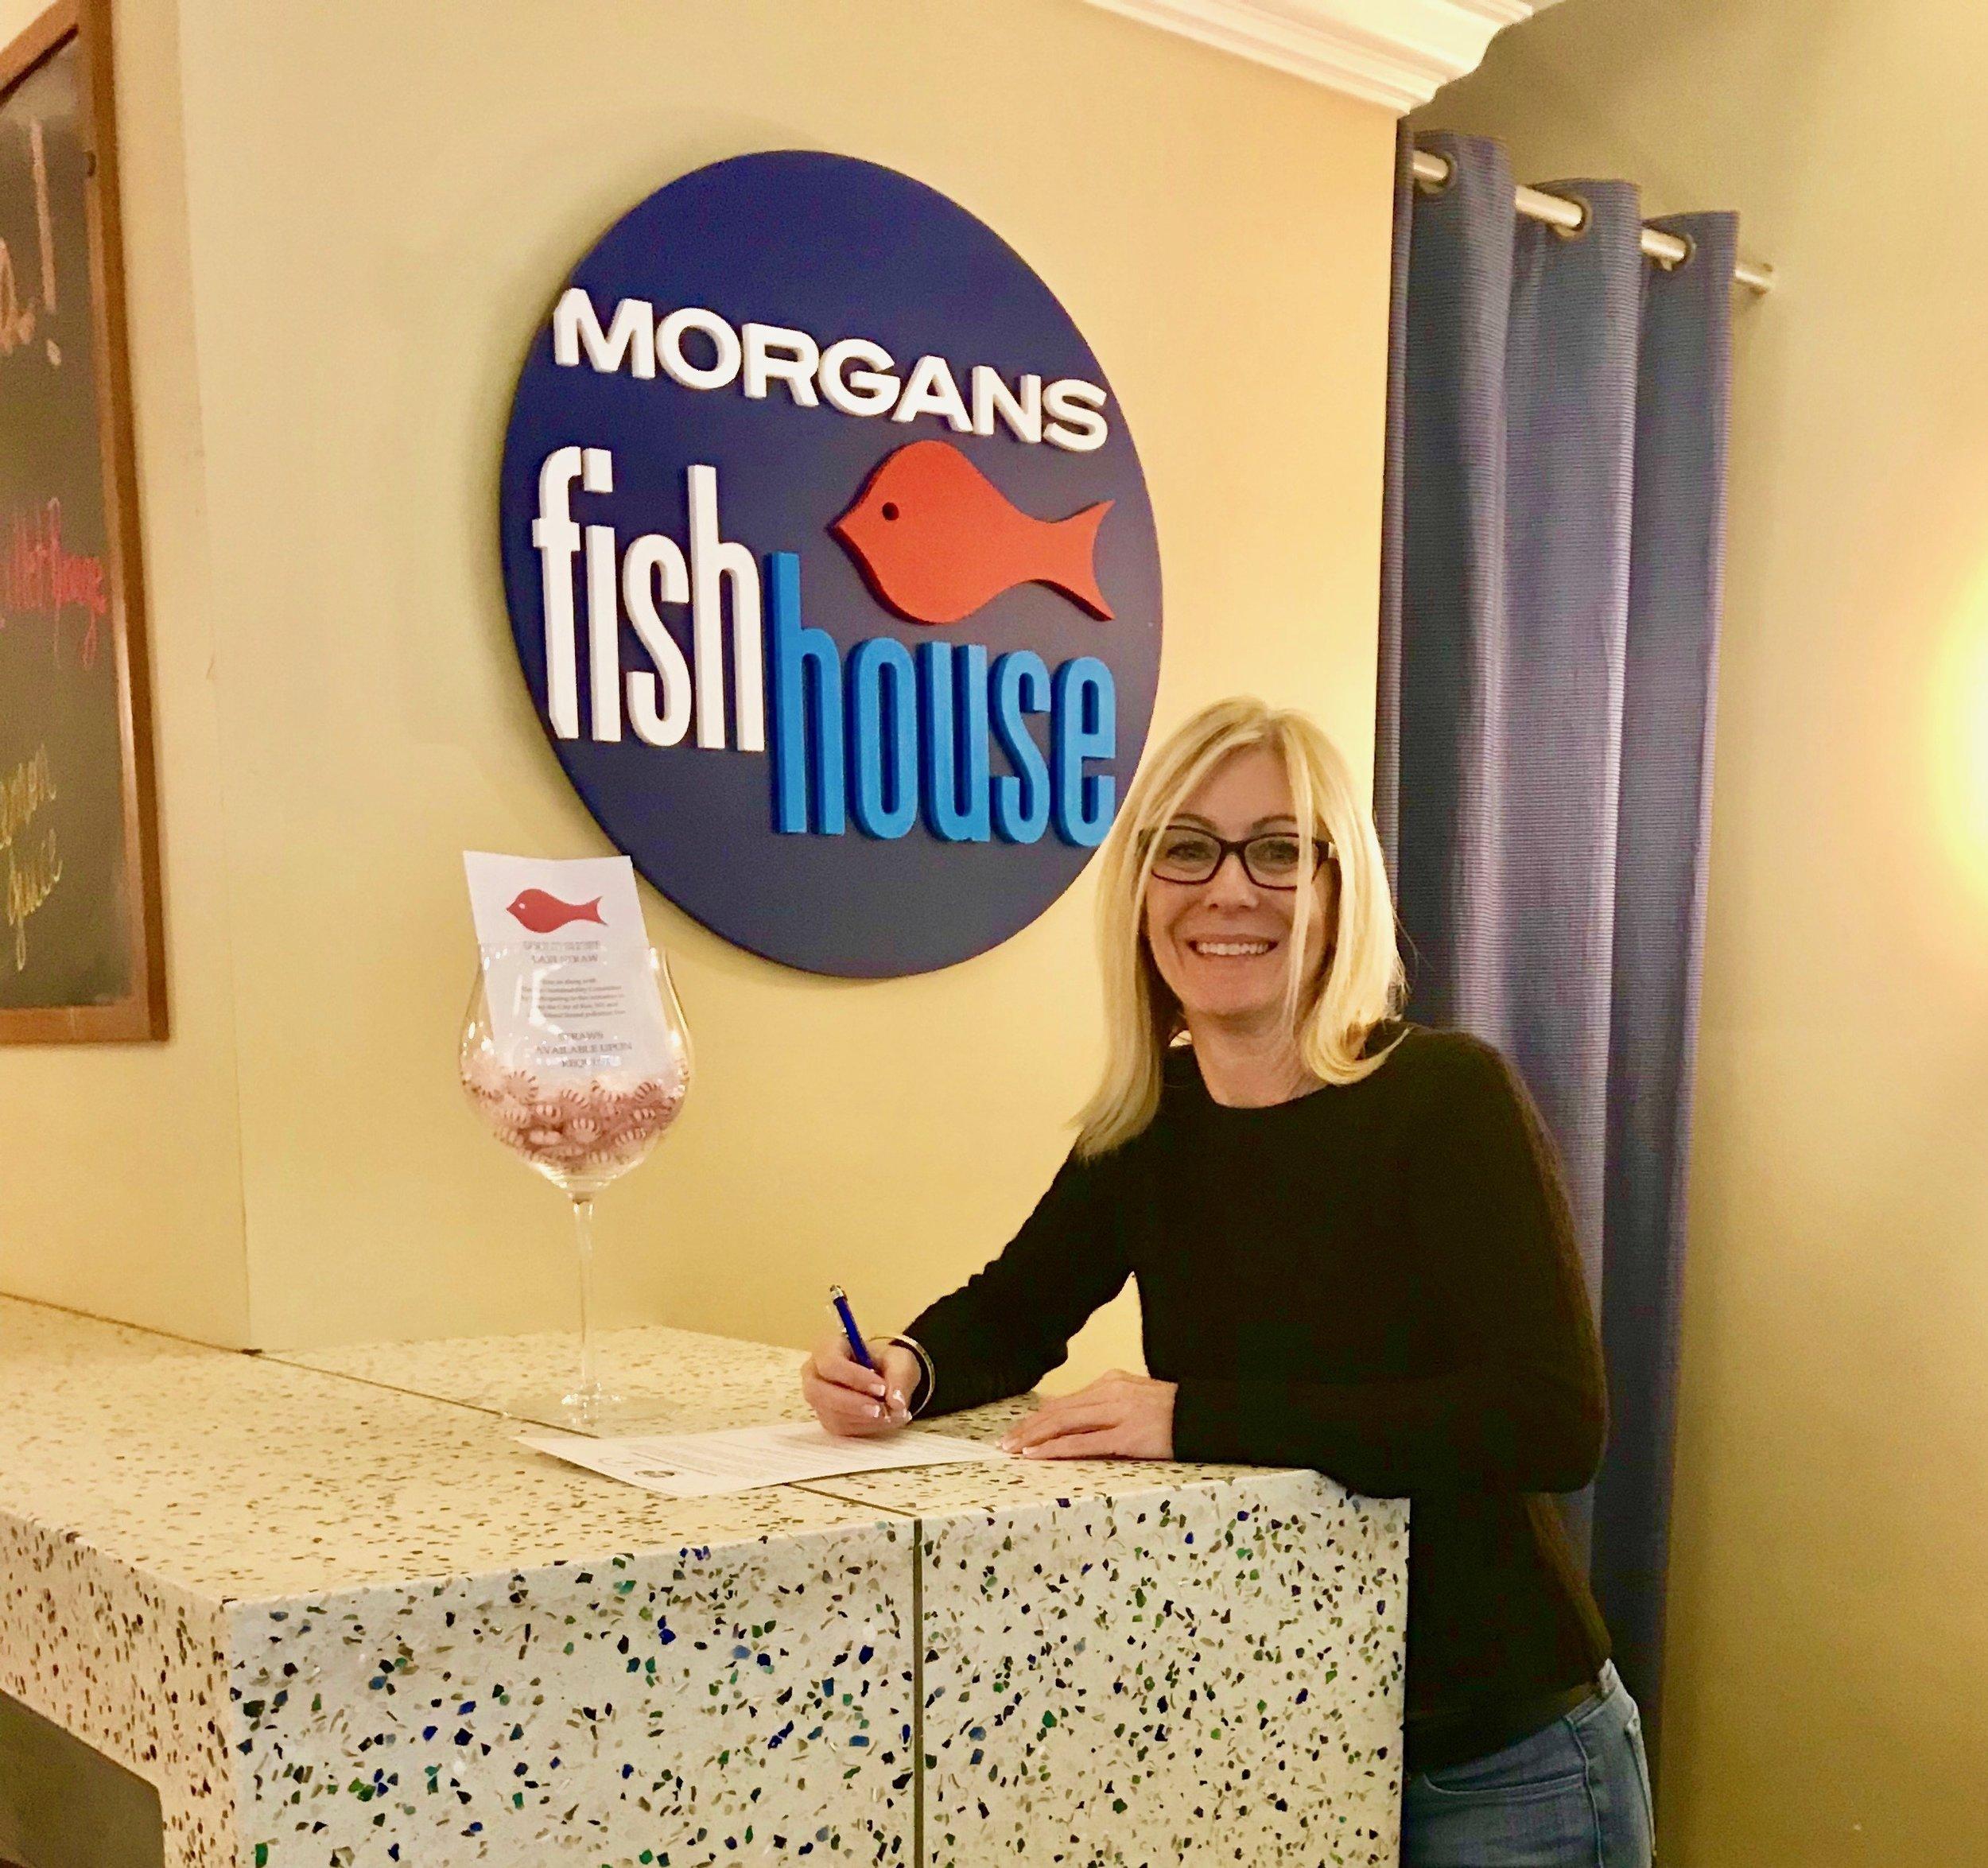 Morgans Fish House has made the SSLS Pledge